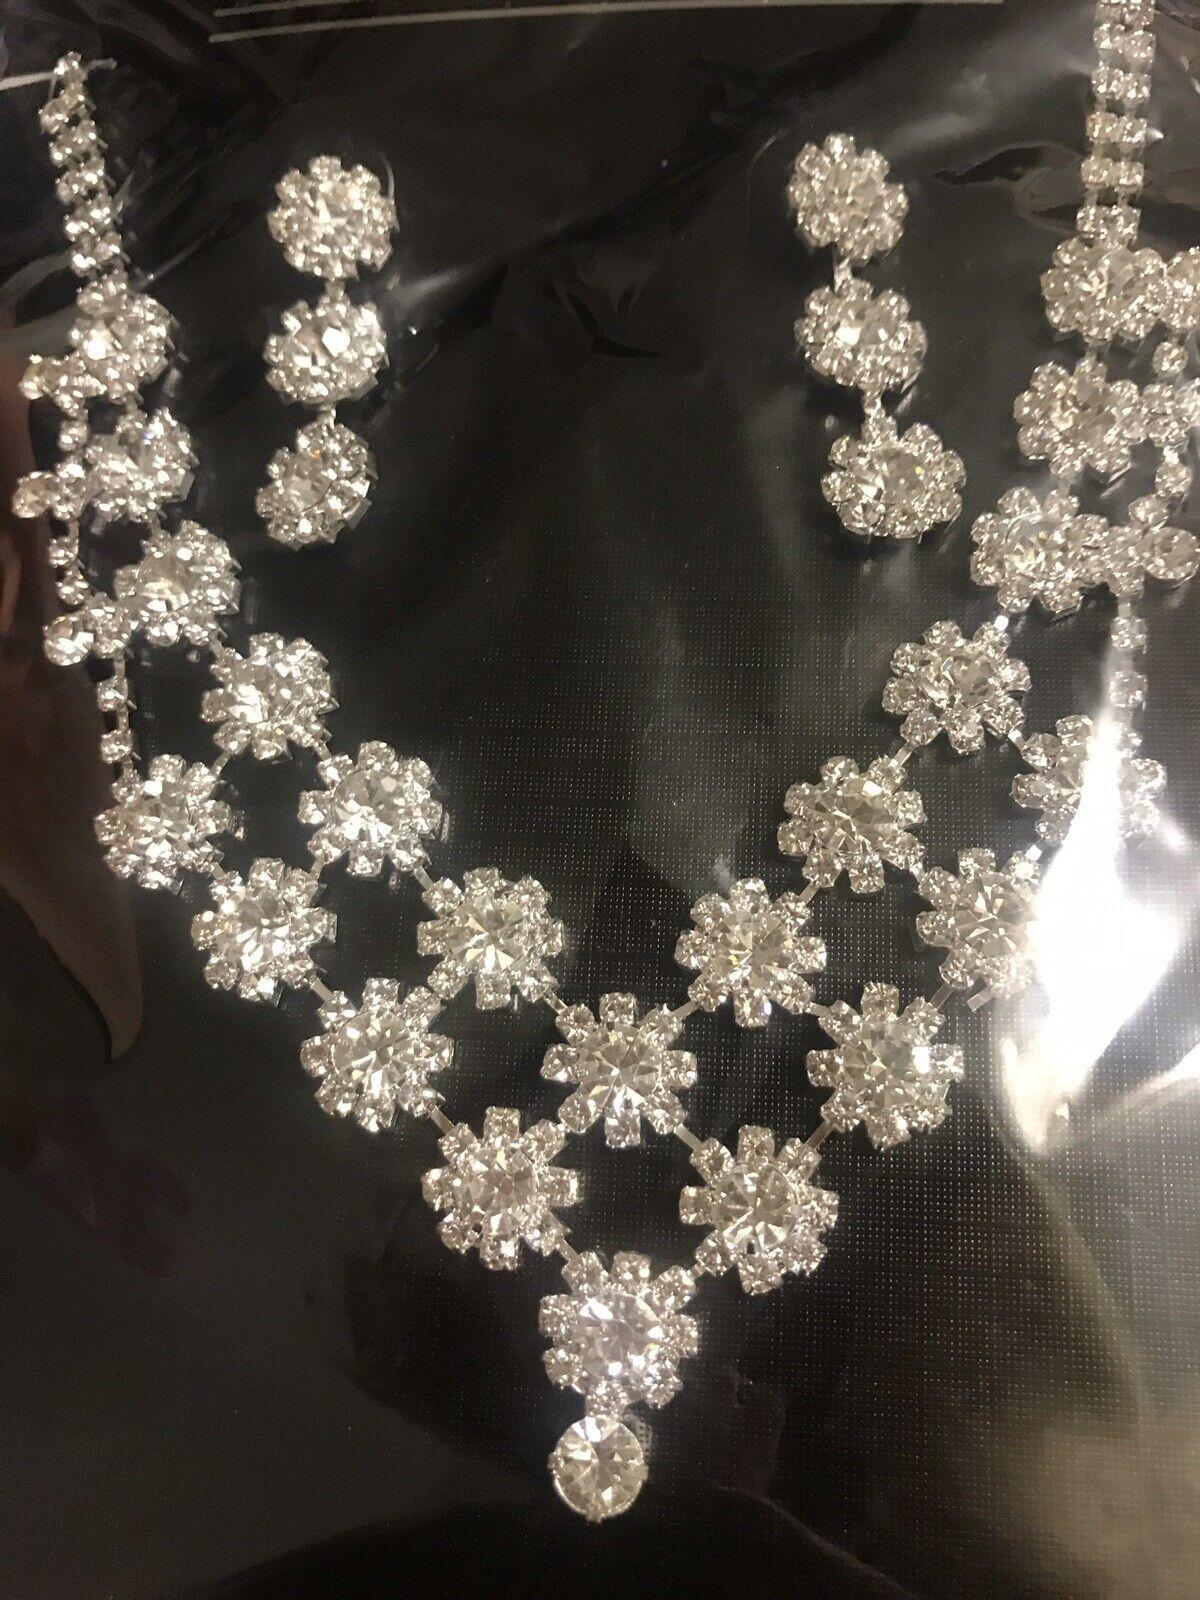 Uk Silver Wedding Bride Crystal Diamond Flower Necklace Earrings